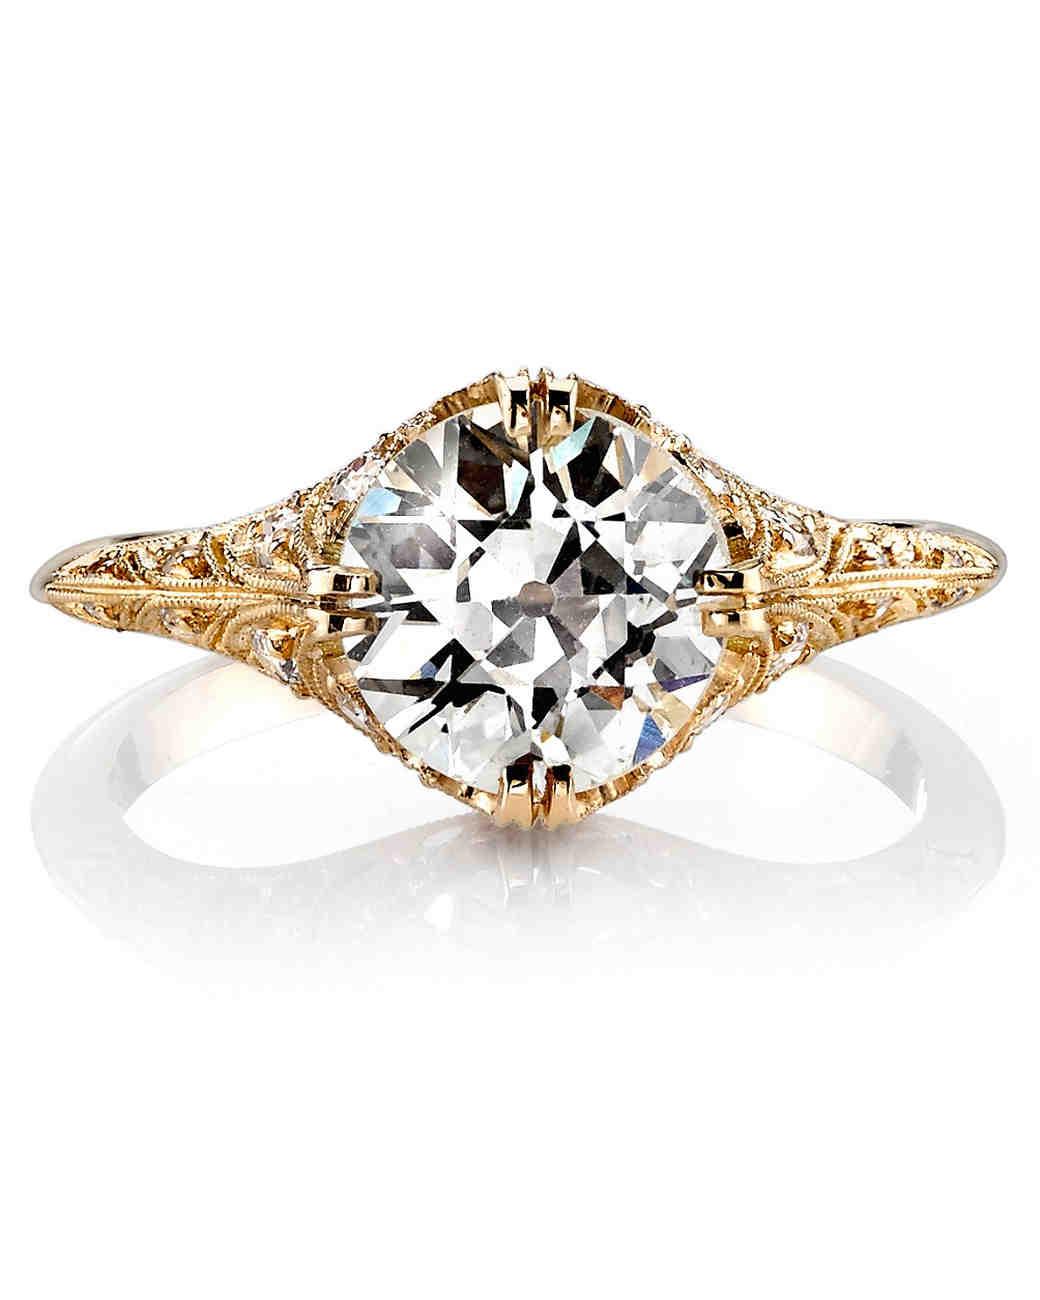 Single Stone Charlotte Euro Cut Yellow Gold Engagement Ring